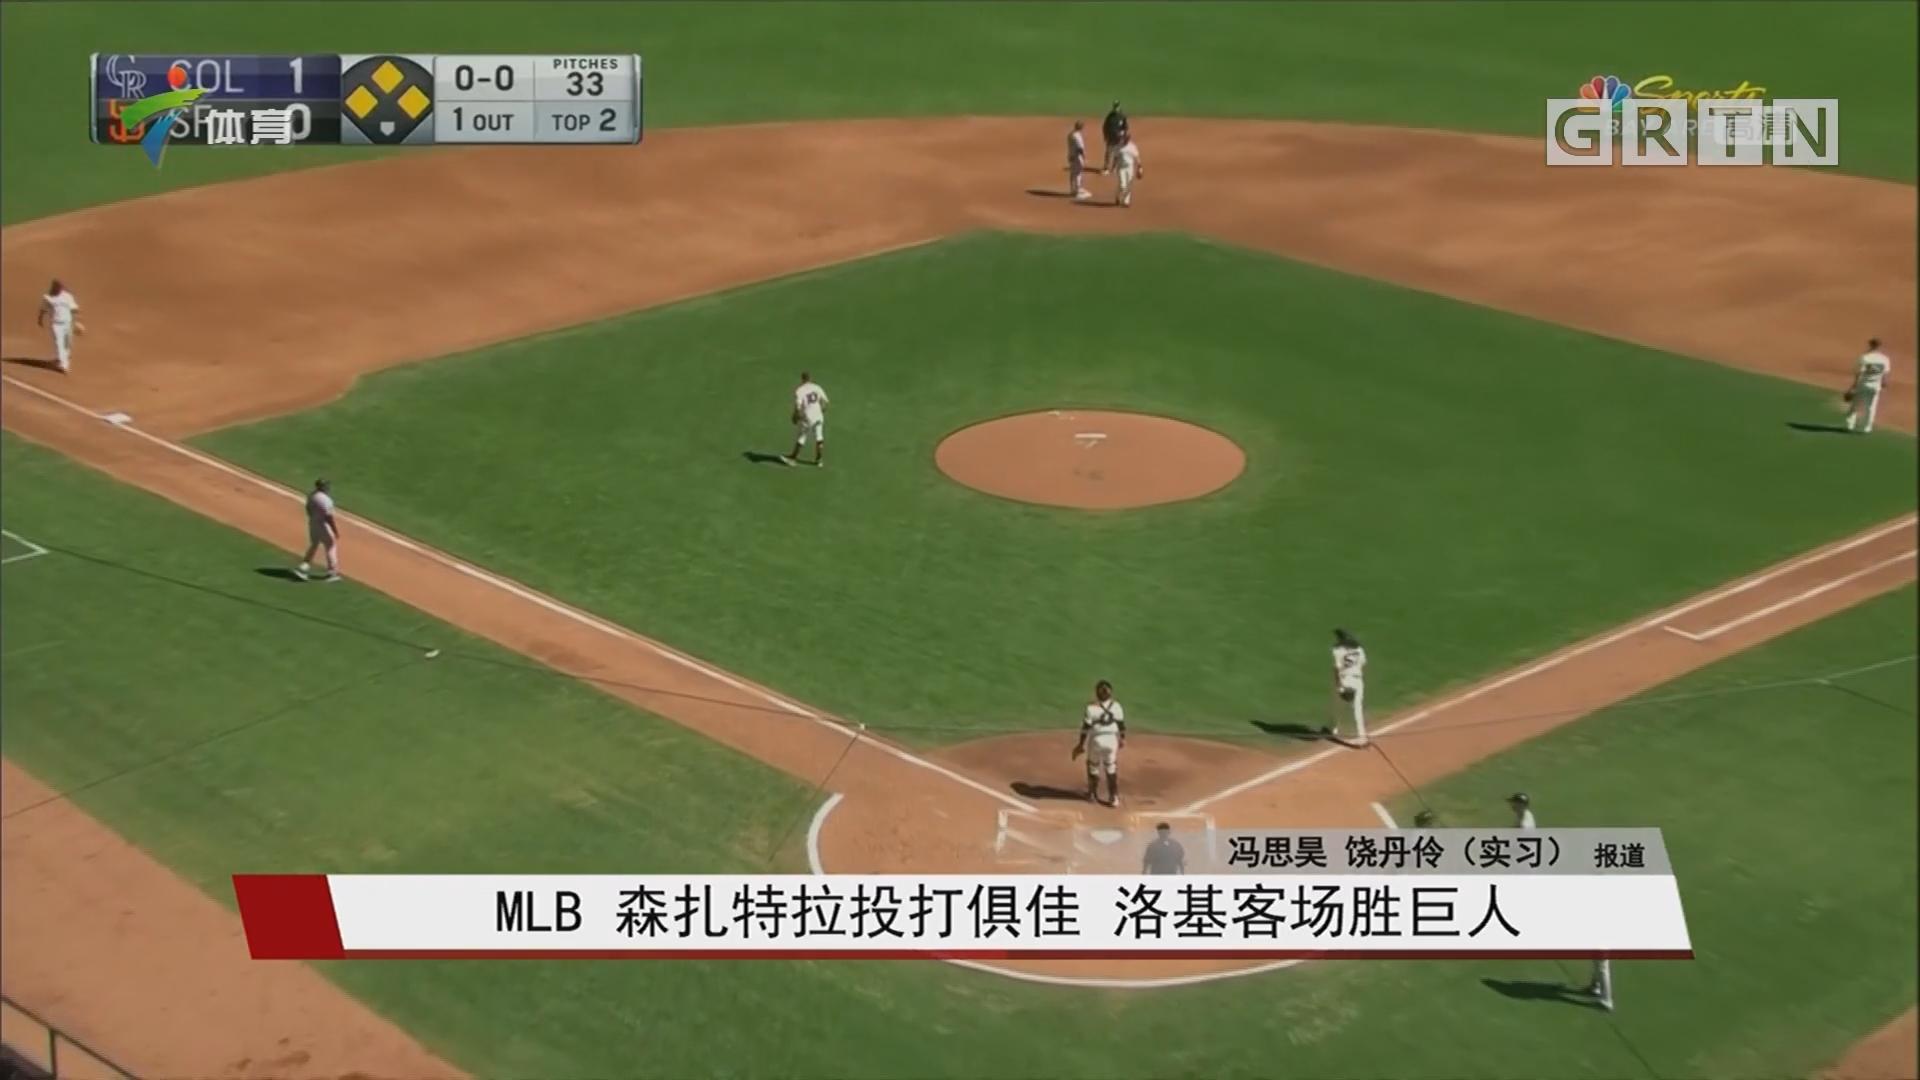 MLB 森扎特拉投打俱佳 洛基客场胜巨人